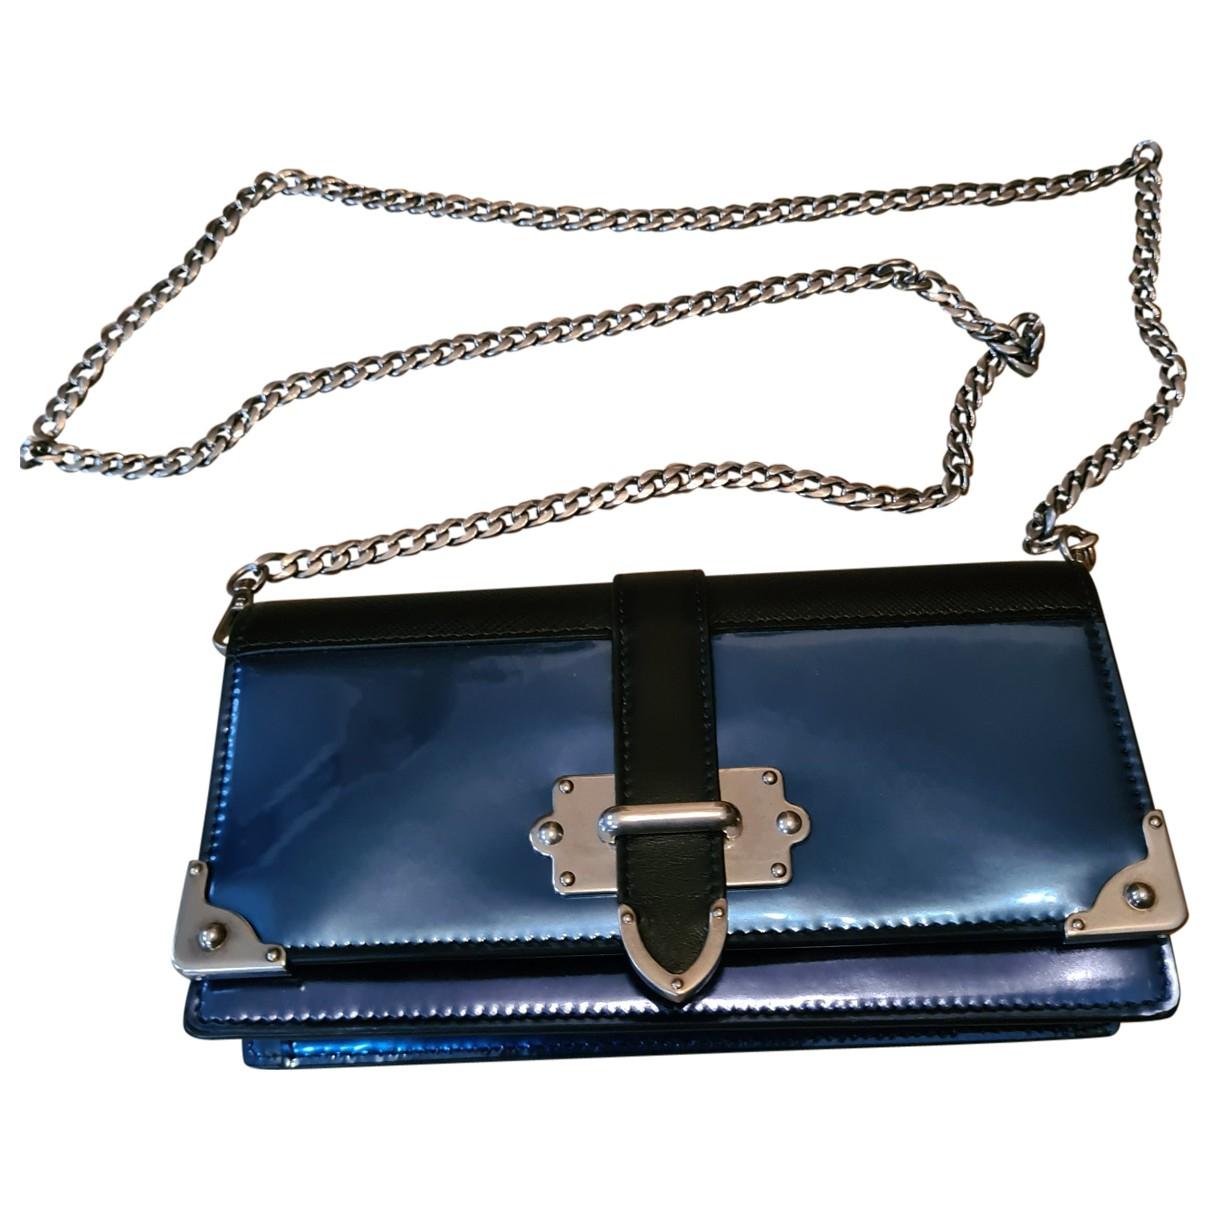 Prada Cahier Clutch in  Blau Lackleder